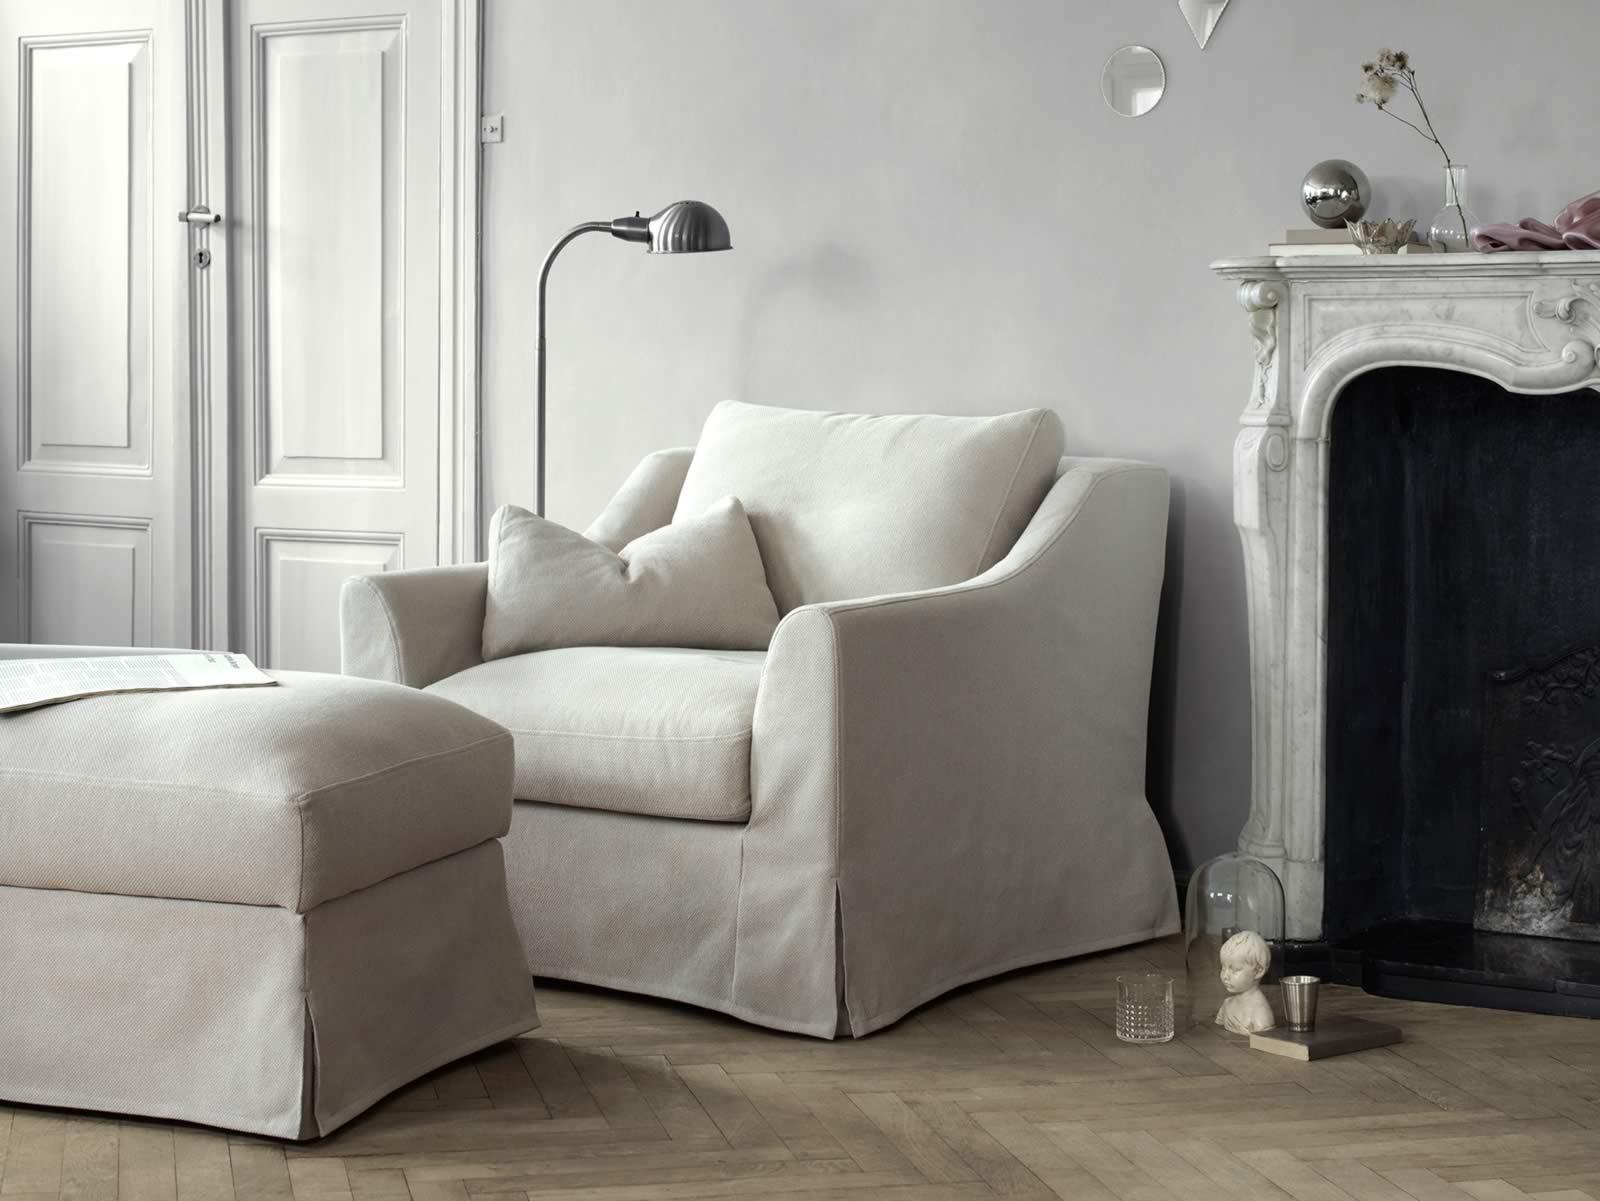 Reviewing The New Ikea Farlov Sofa Series Back To Basics